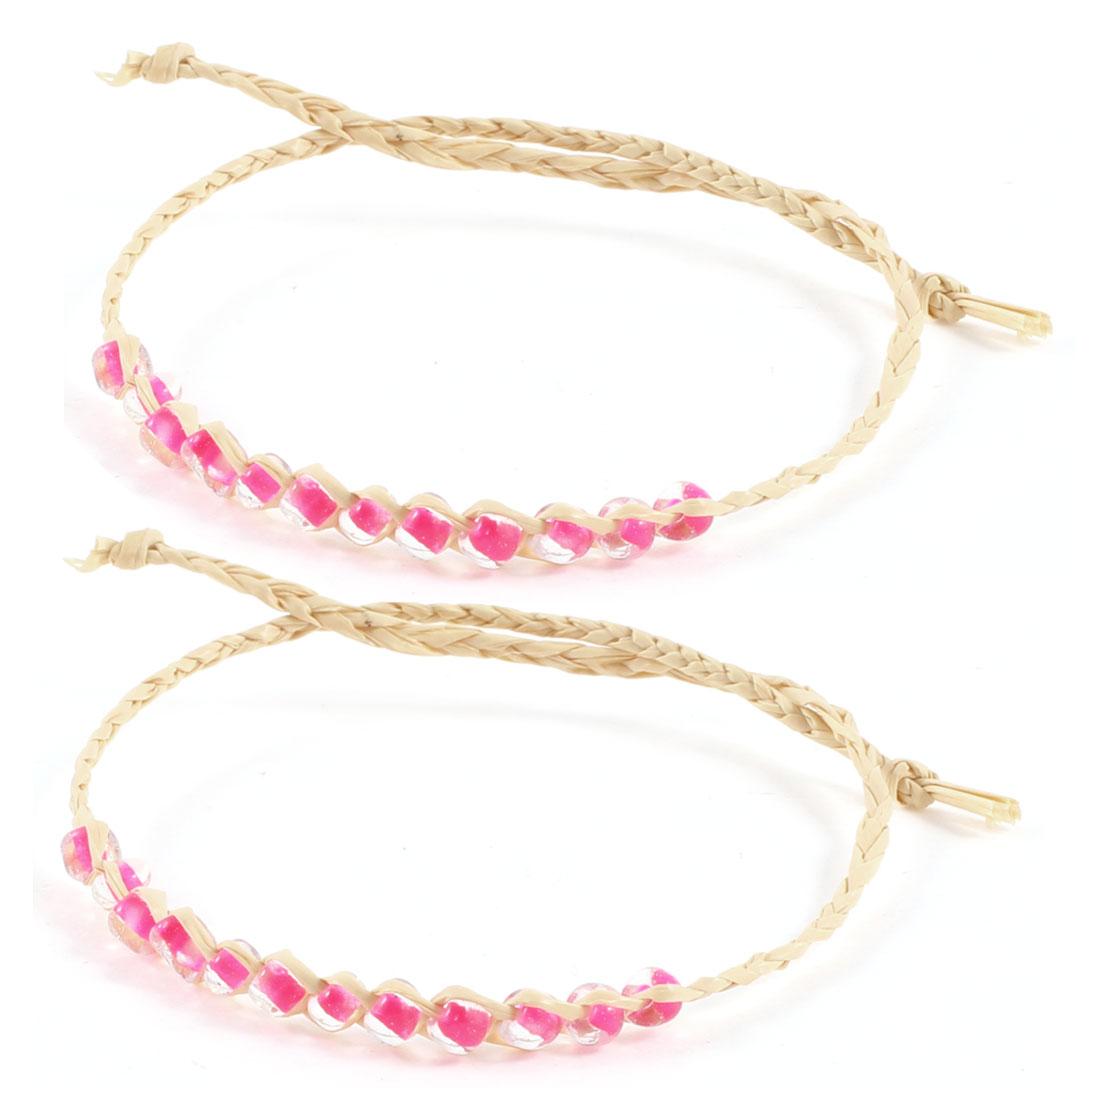 Maganta Beige Glittery Beads Decorated Lucky Straw Bracelets Bangle 2PCS